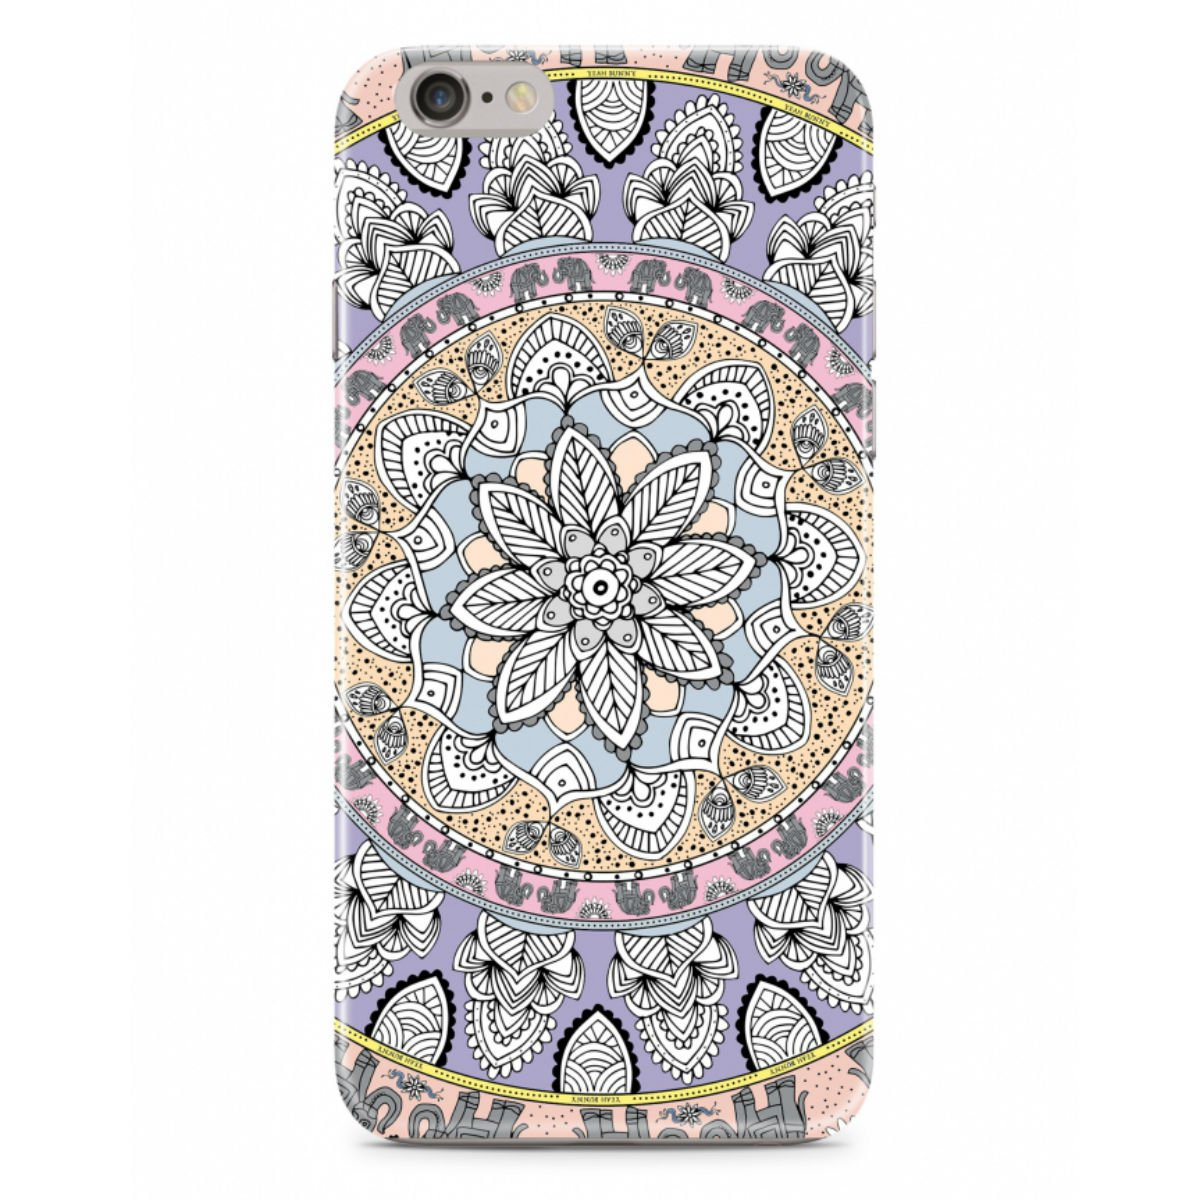 Barevný kryt na iPhone 5/5s - Tapestry